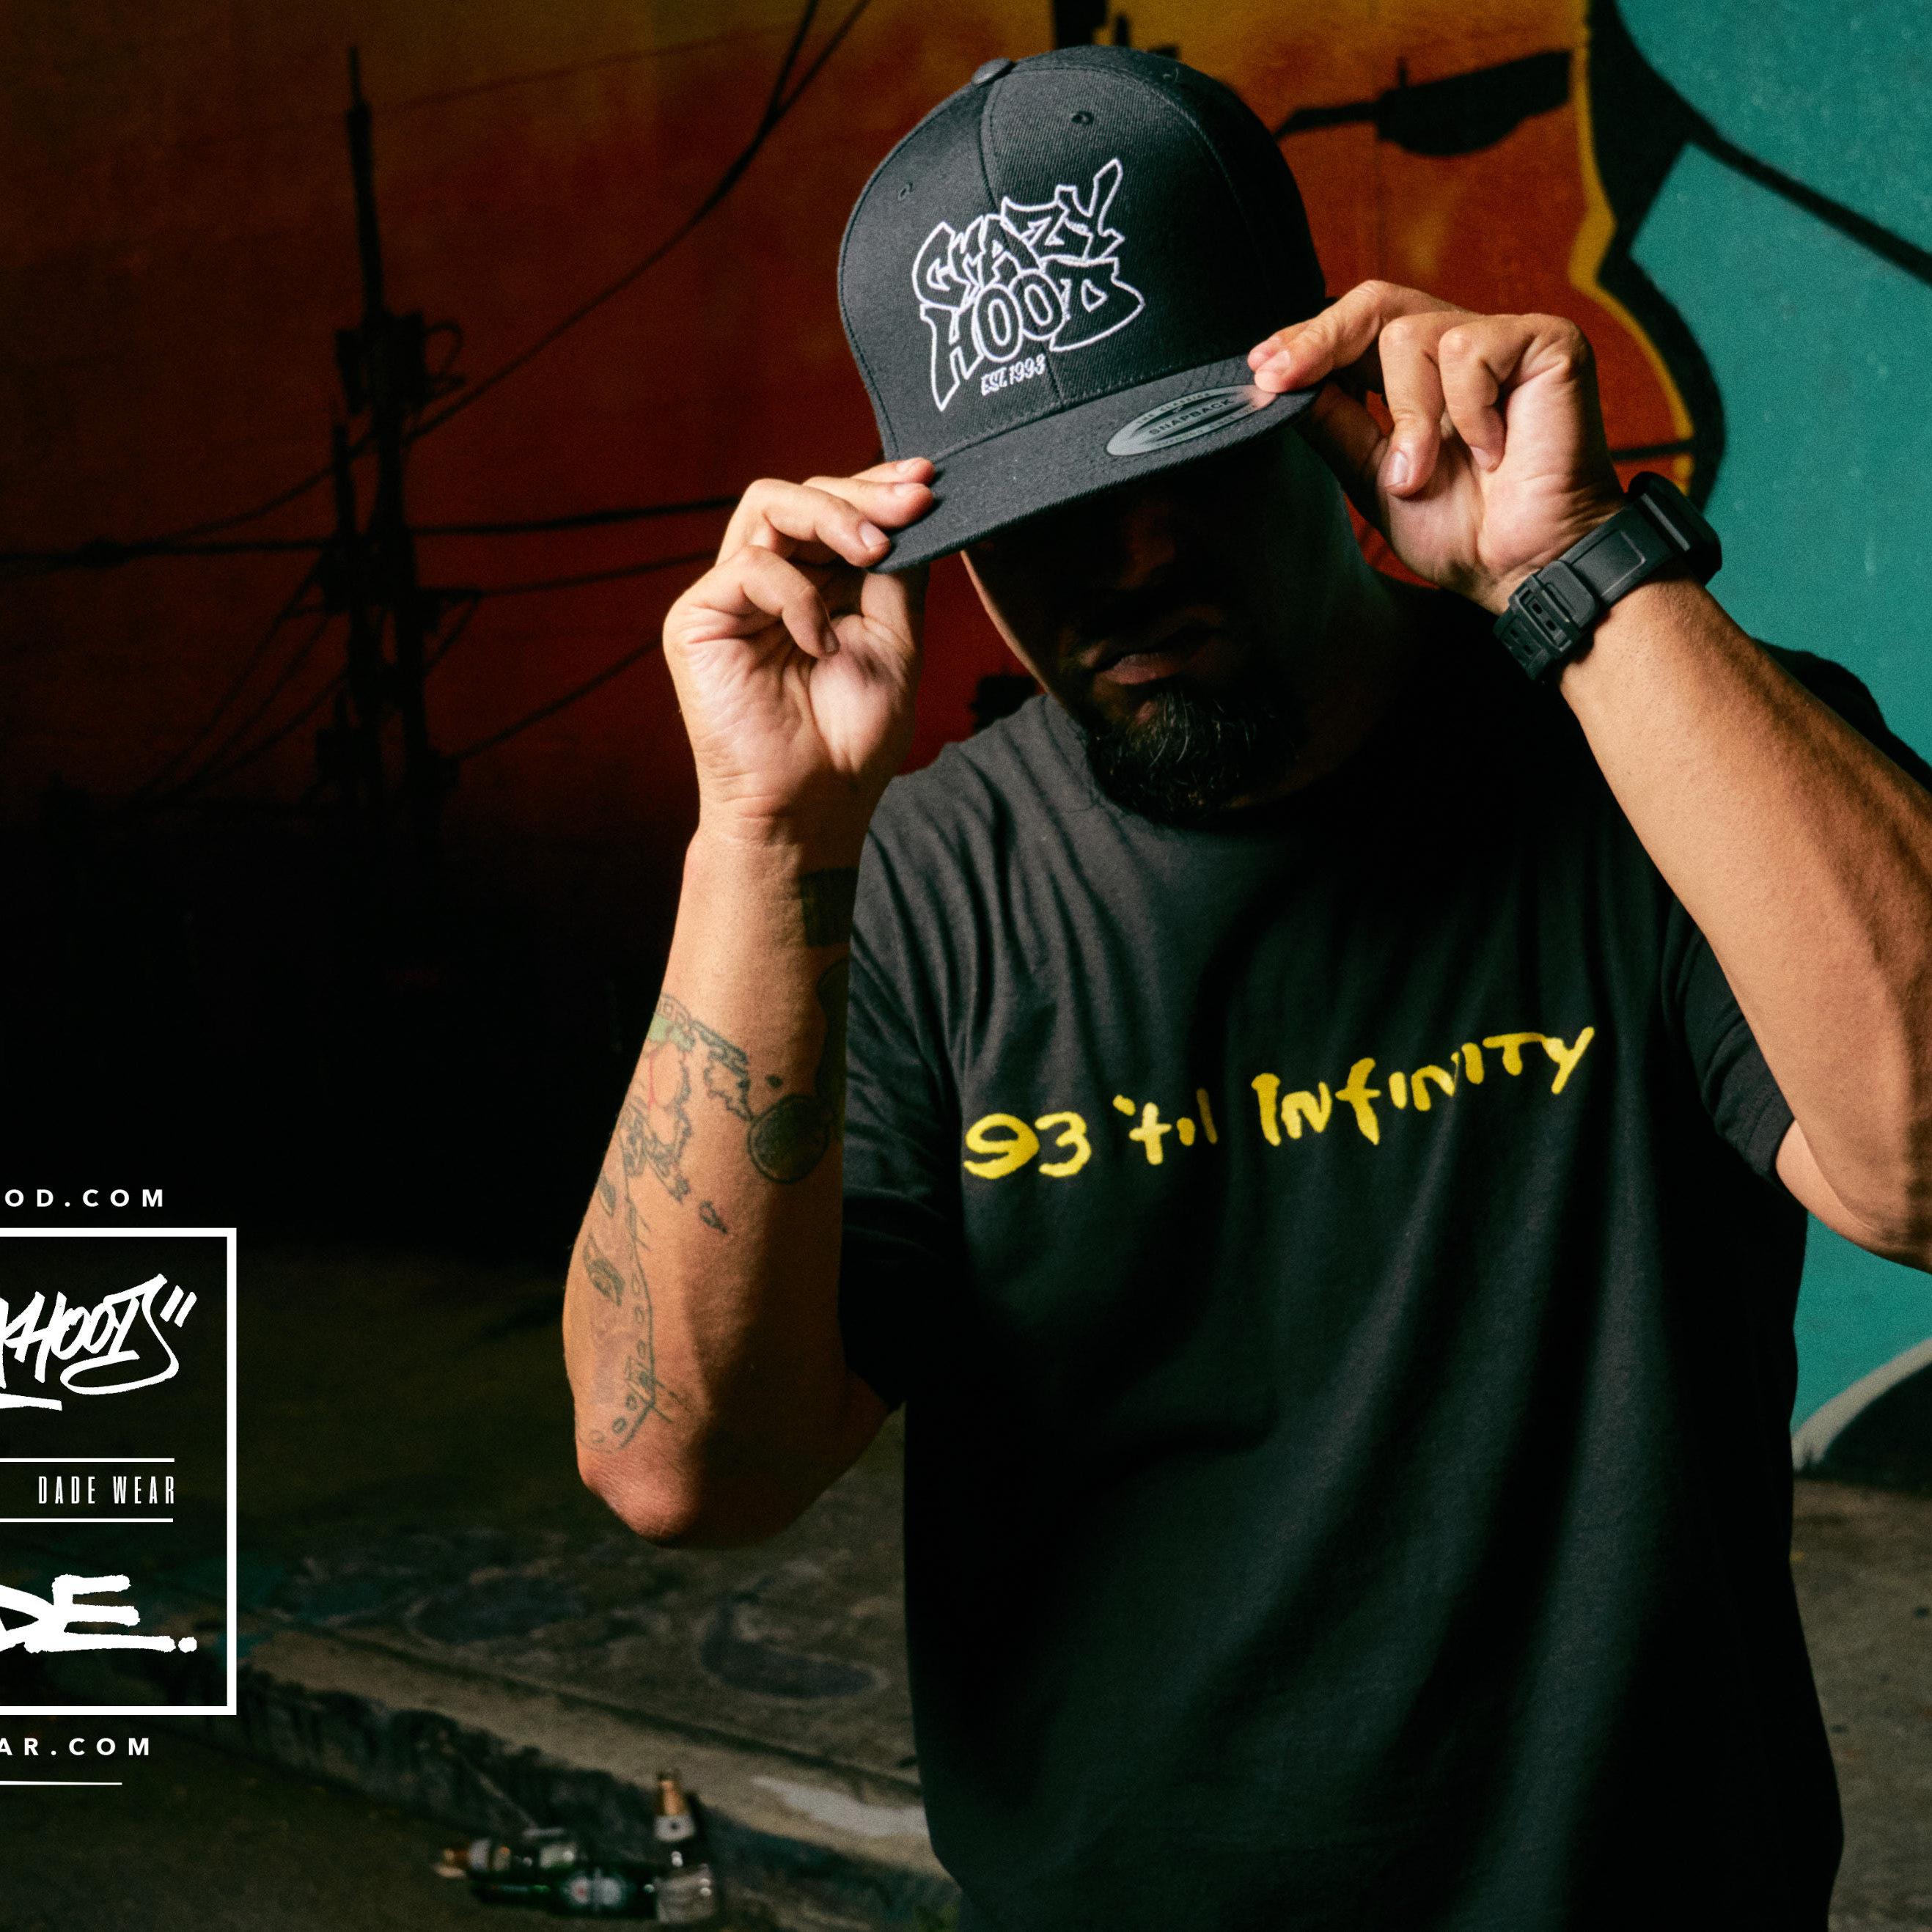 CrazyHood-x-DadeWear-Garcia-with-the-hat-on-93-shirt